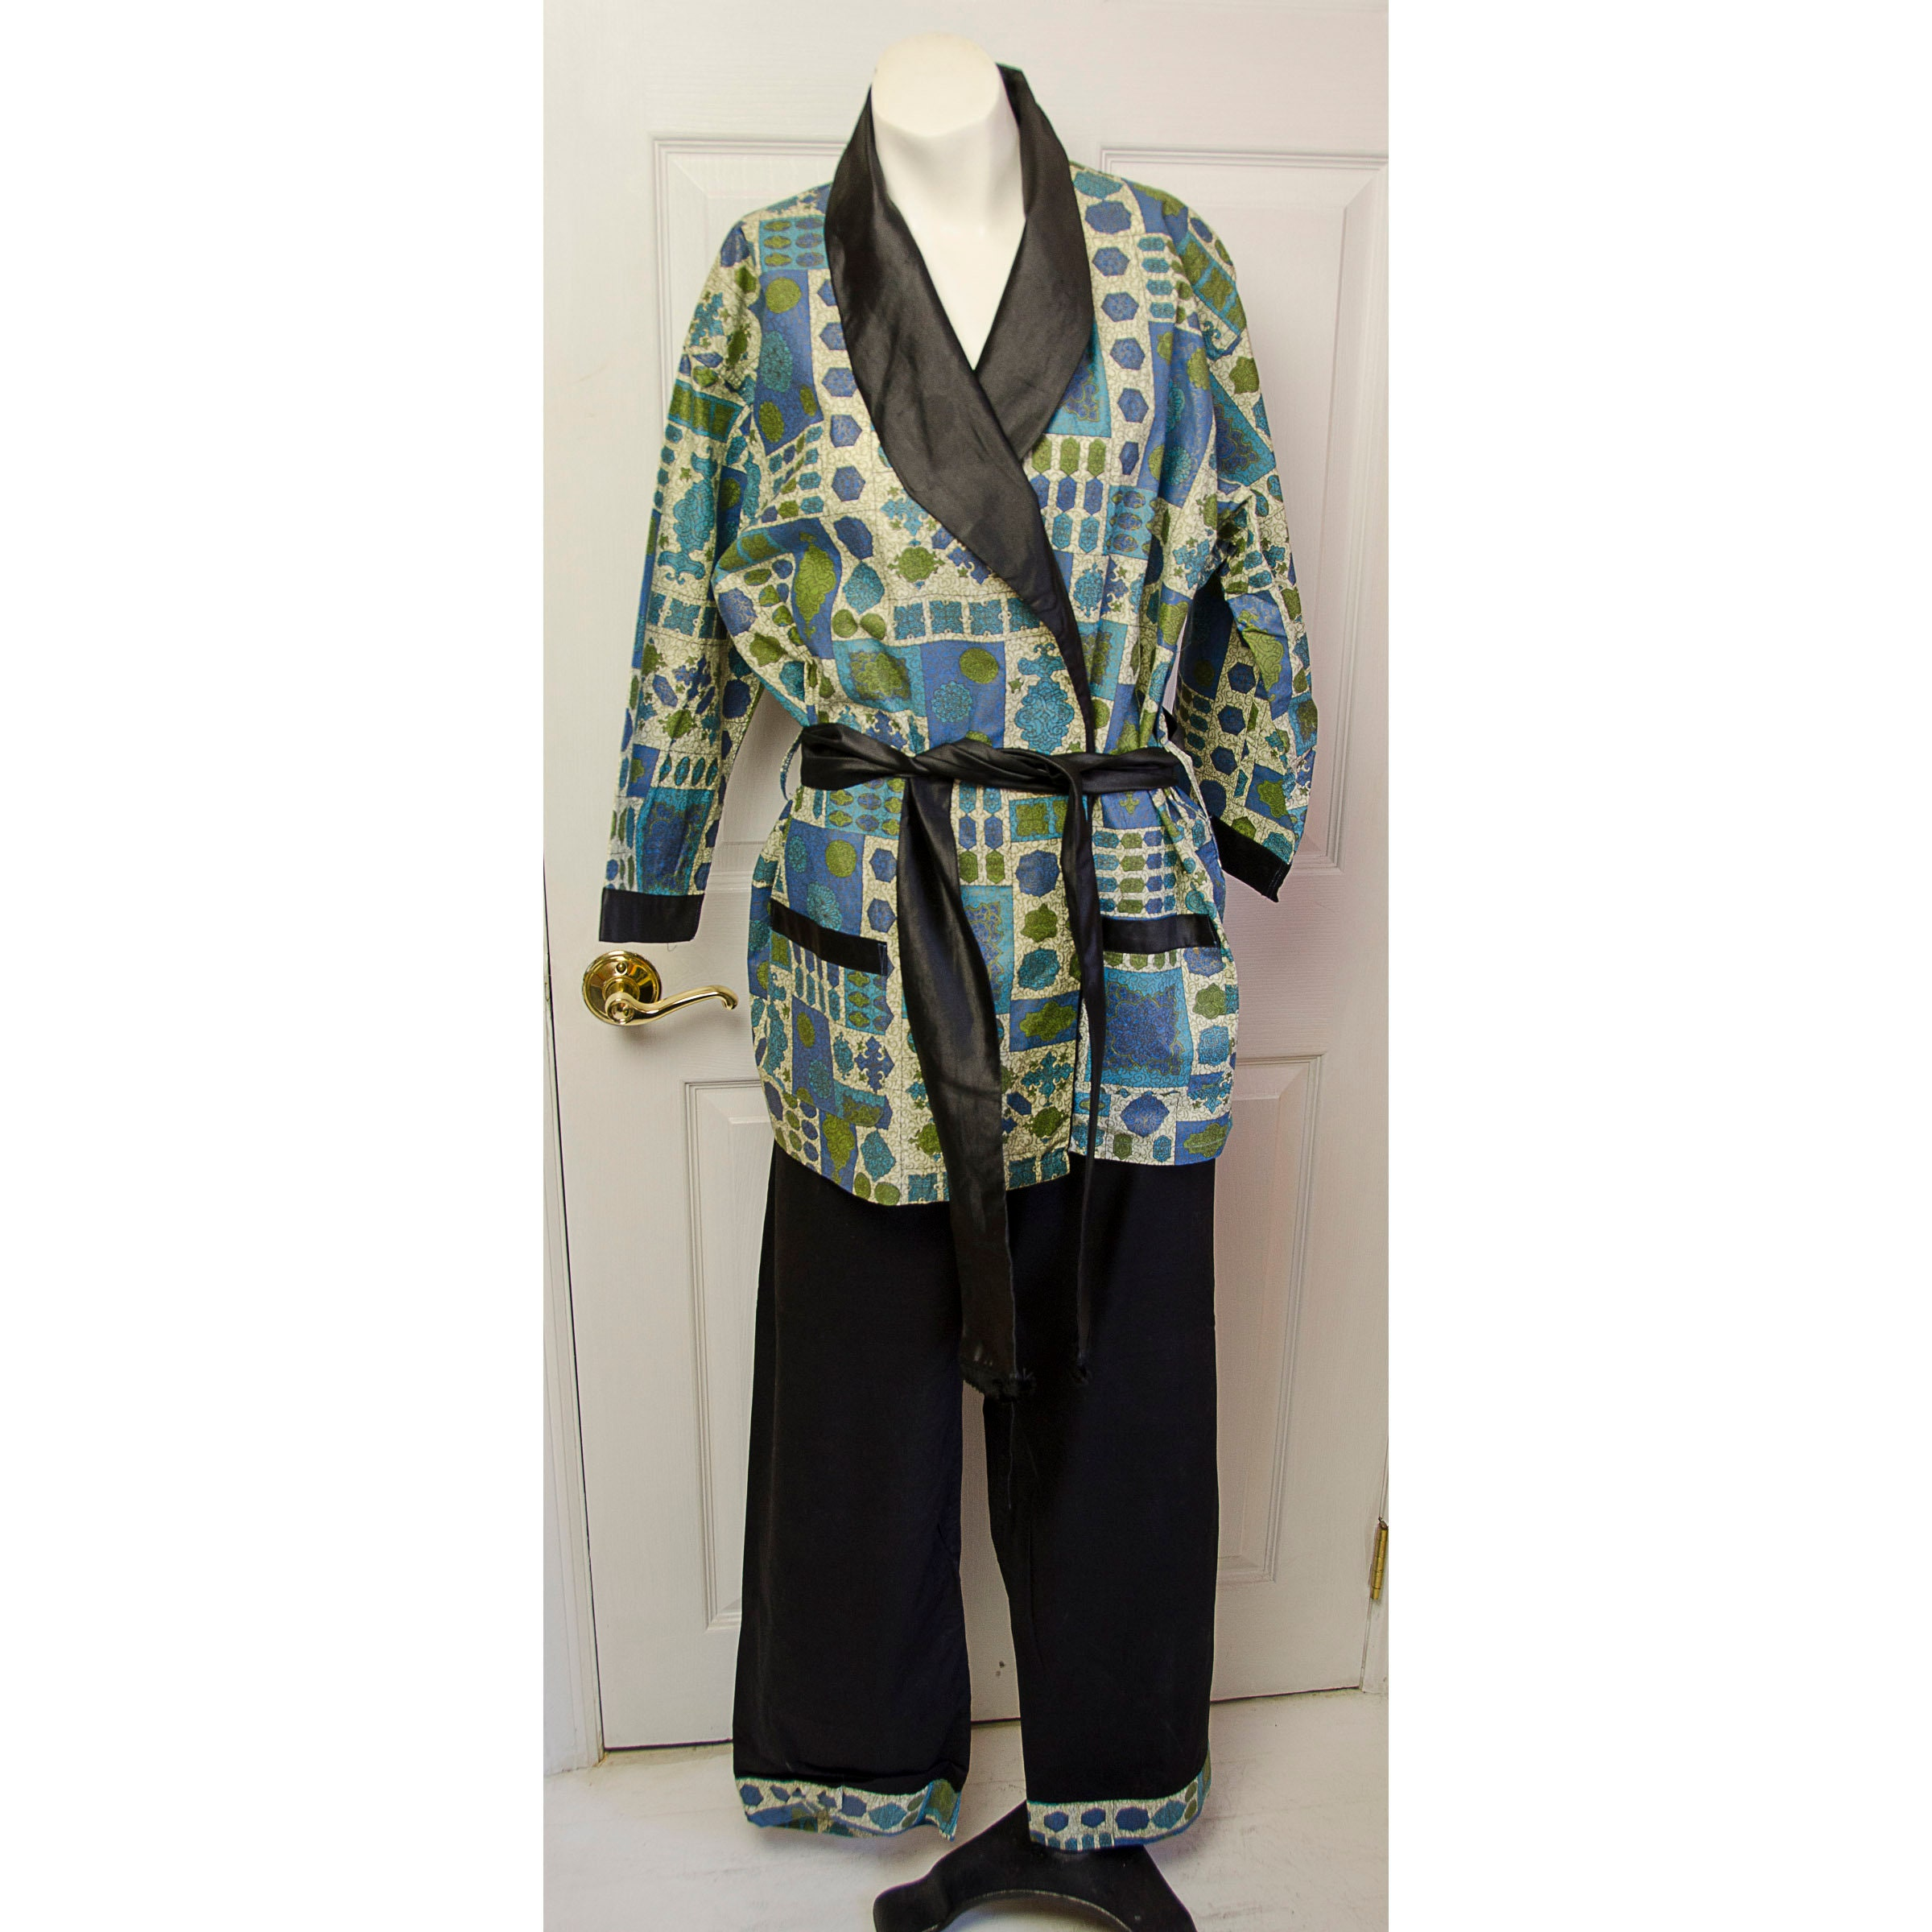 1950s Men's Ties, Bow Ties – Vintage, Skinny, Knit Vintage 1950s 60s Mens Pleetway Mahatma Lounging Pajamas With Balloon Seat $175.00 AT vintagedancer.com